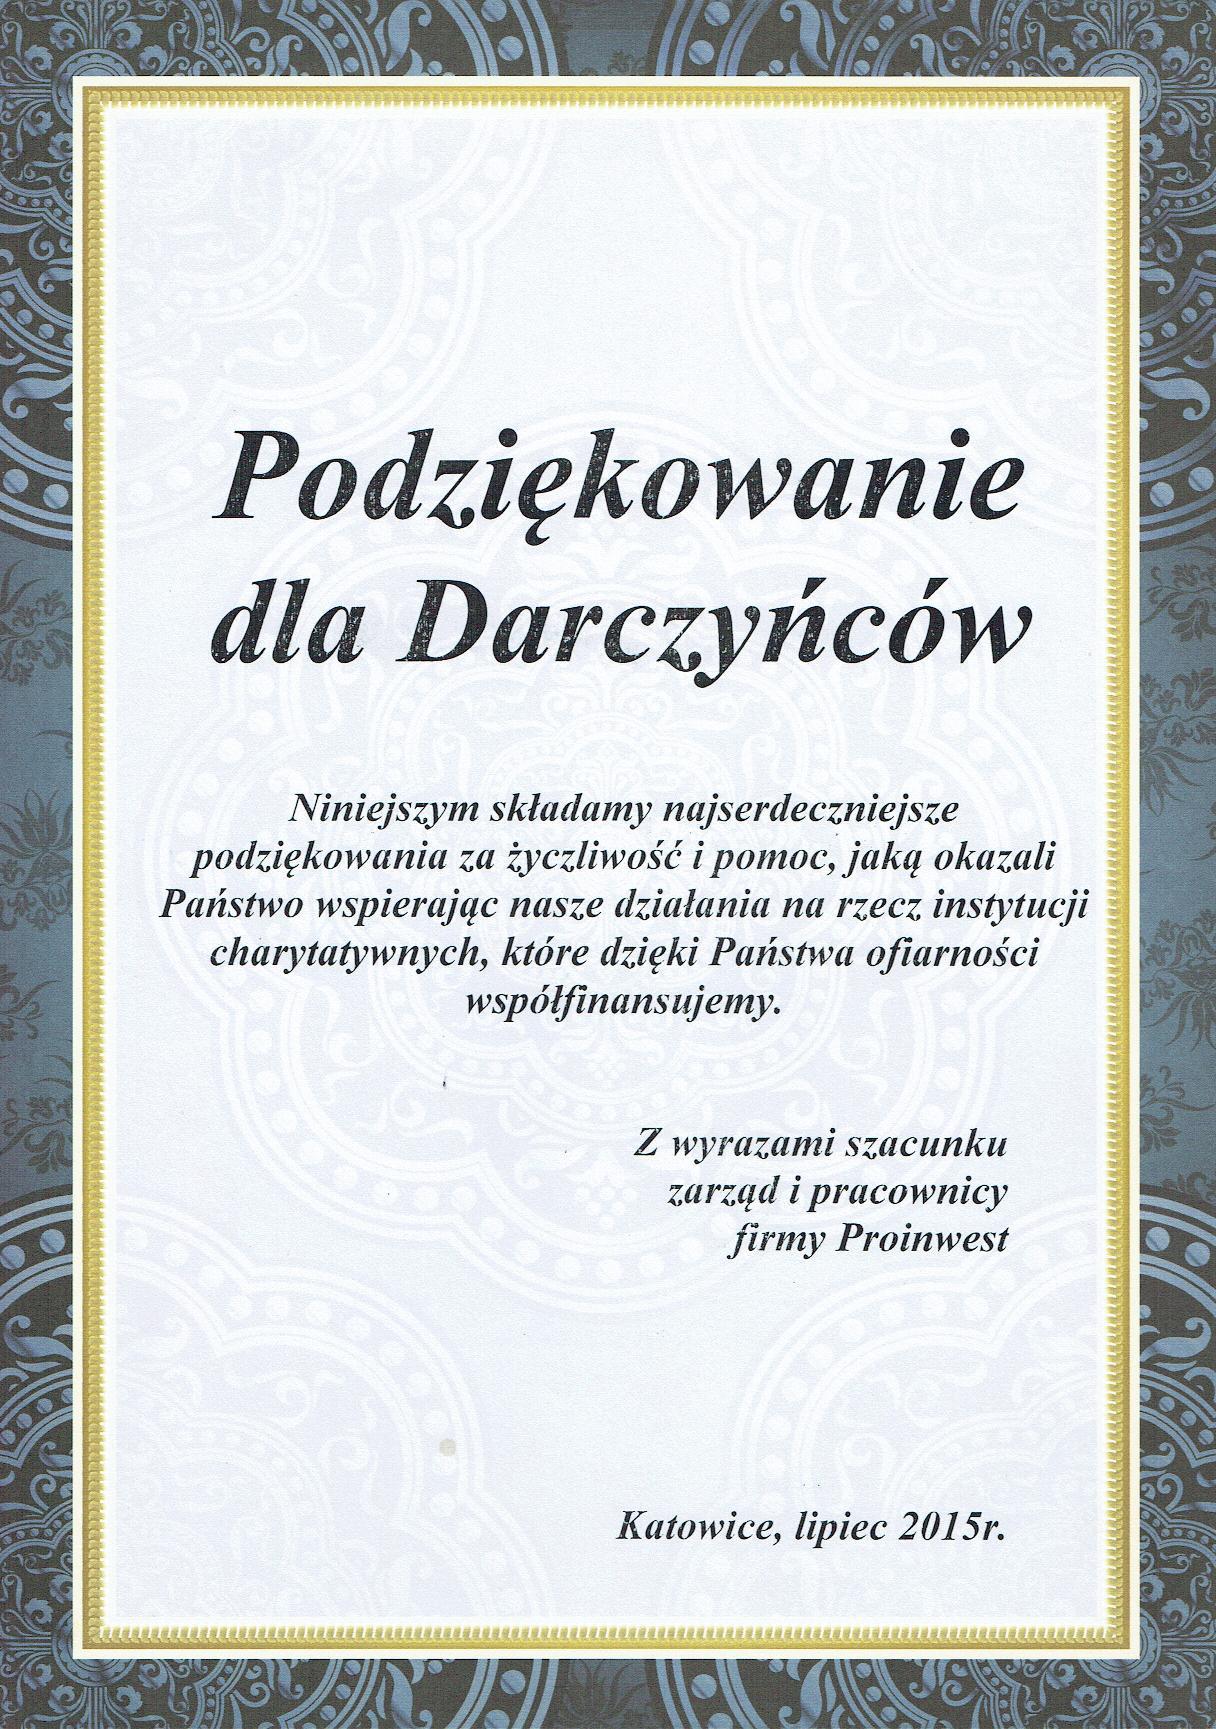 podziekowania-page-002